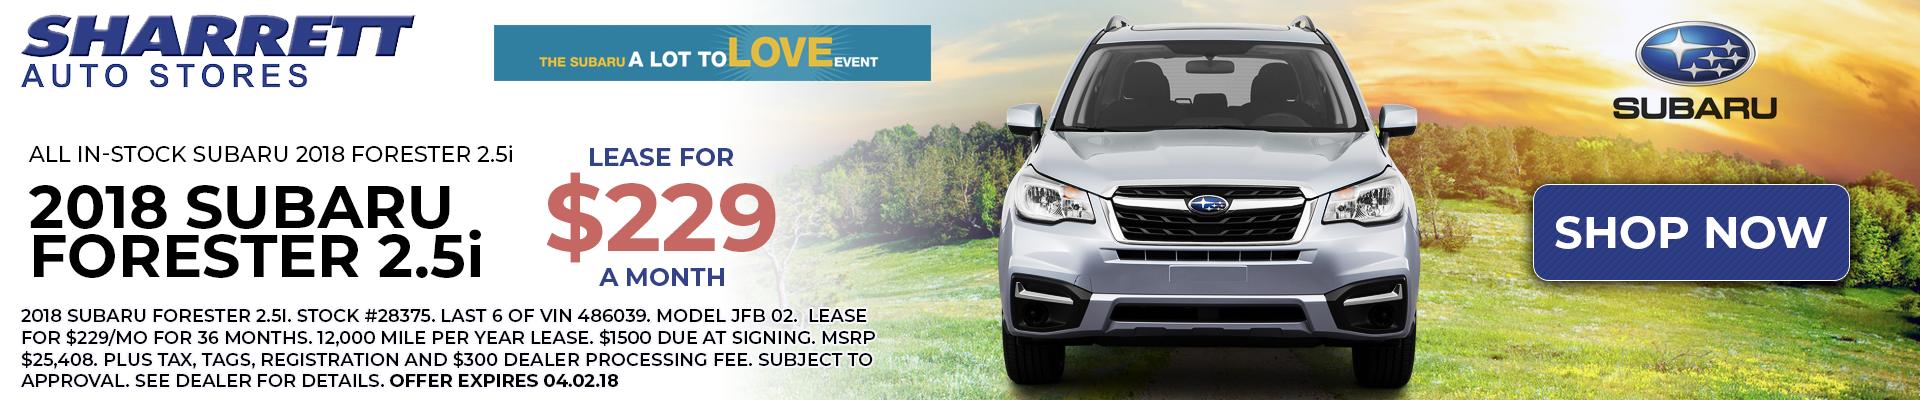 Your Hagerstown Subaru Dealer See This Month Subaru Online Deals - Subaru dealership maryland